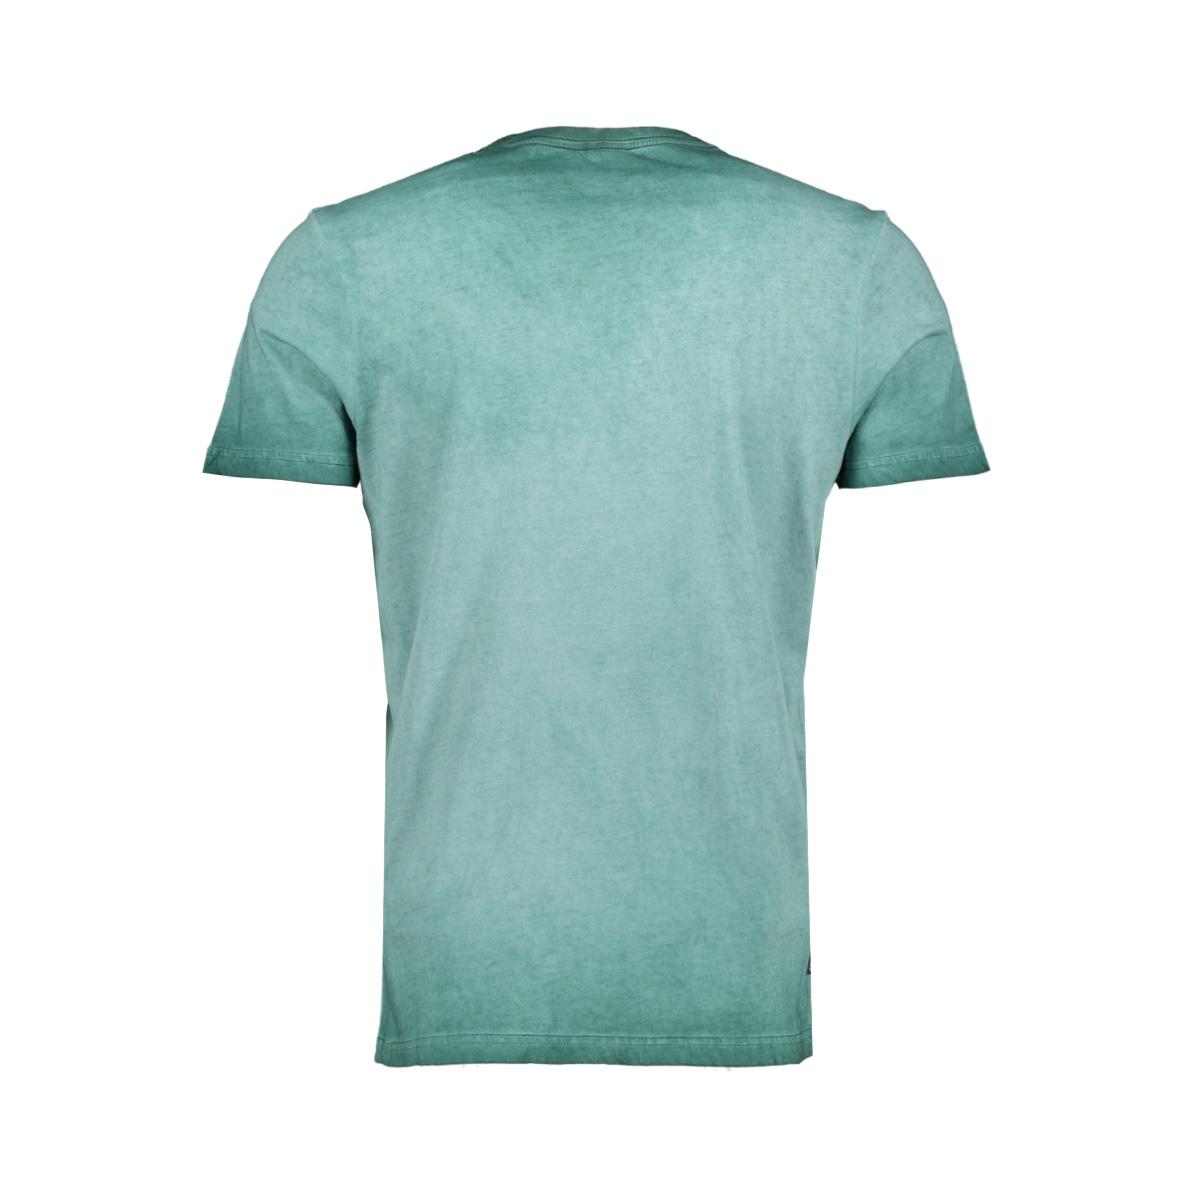 ptss191512 pme legend t-shirt 6082